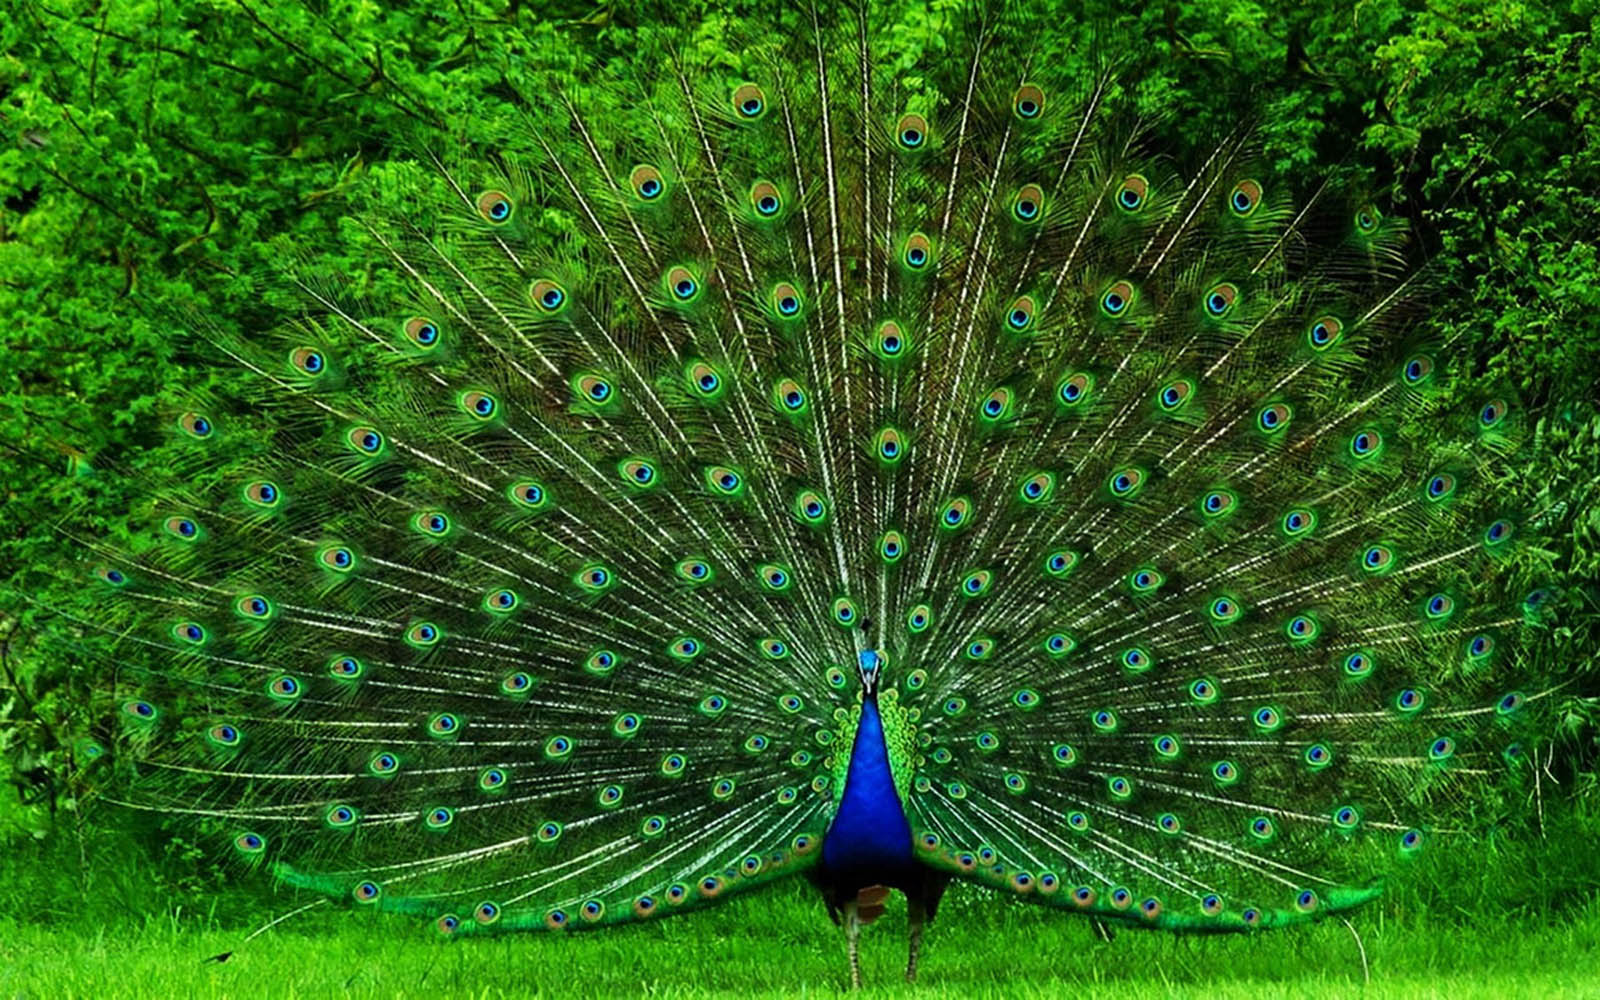 49+] Peacock Wallpaper for the House on WallpaperSafari